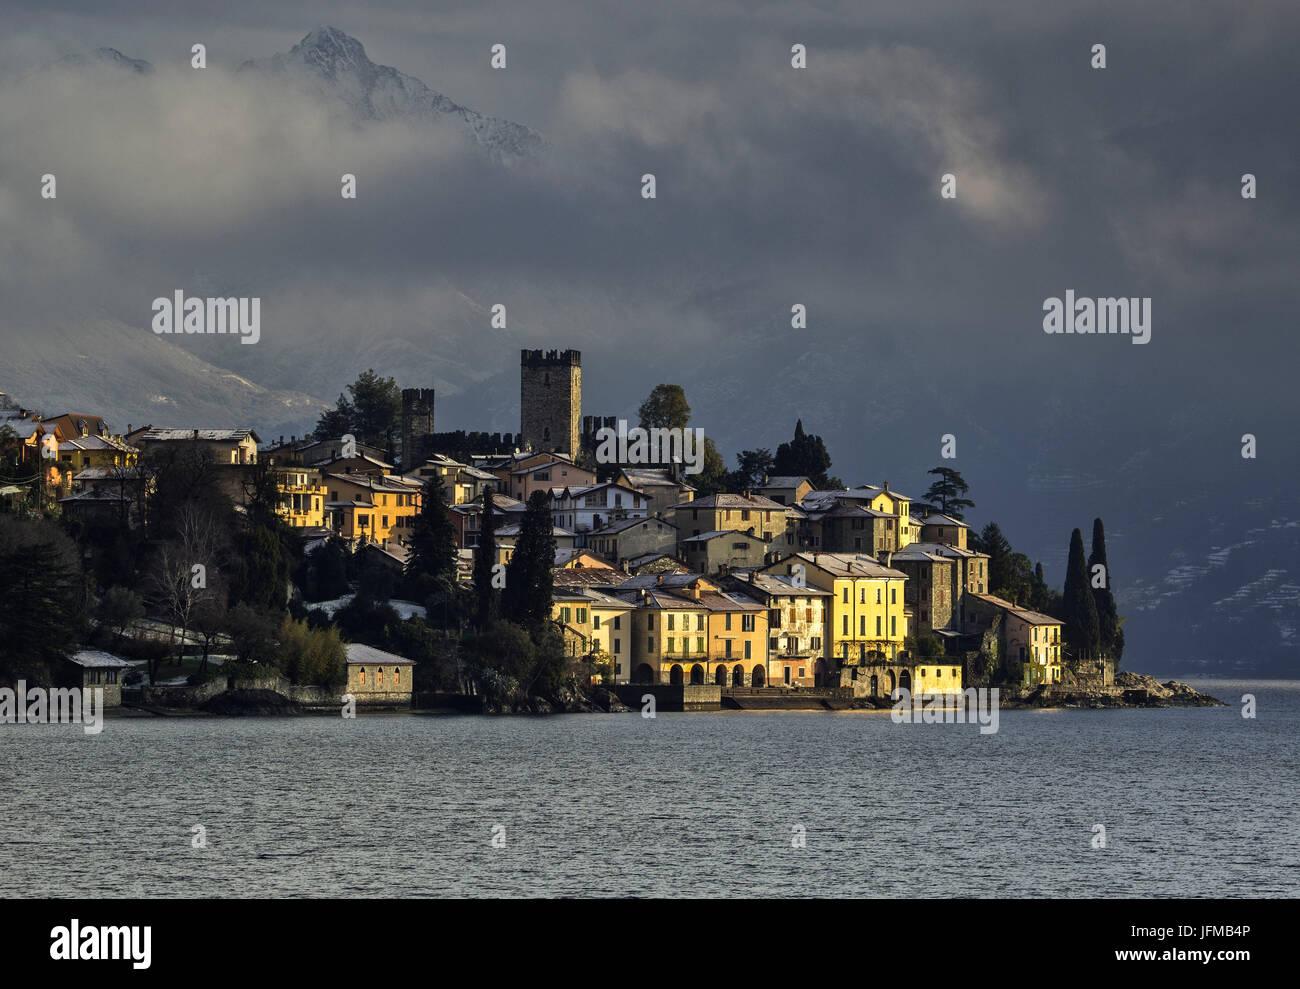 Italy, Lombardy, Como district, Como Lake, Rezzonico, san siro, Stock Photo